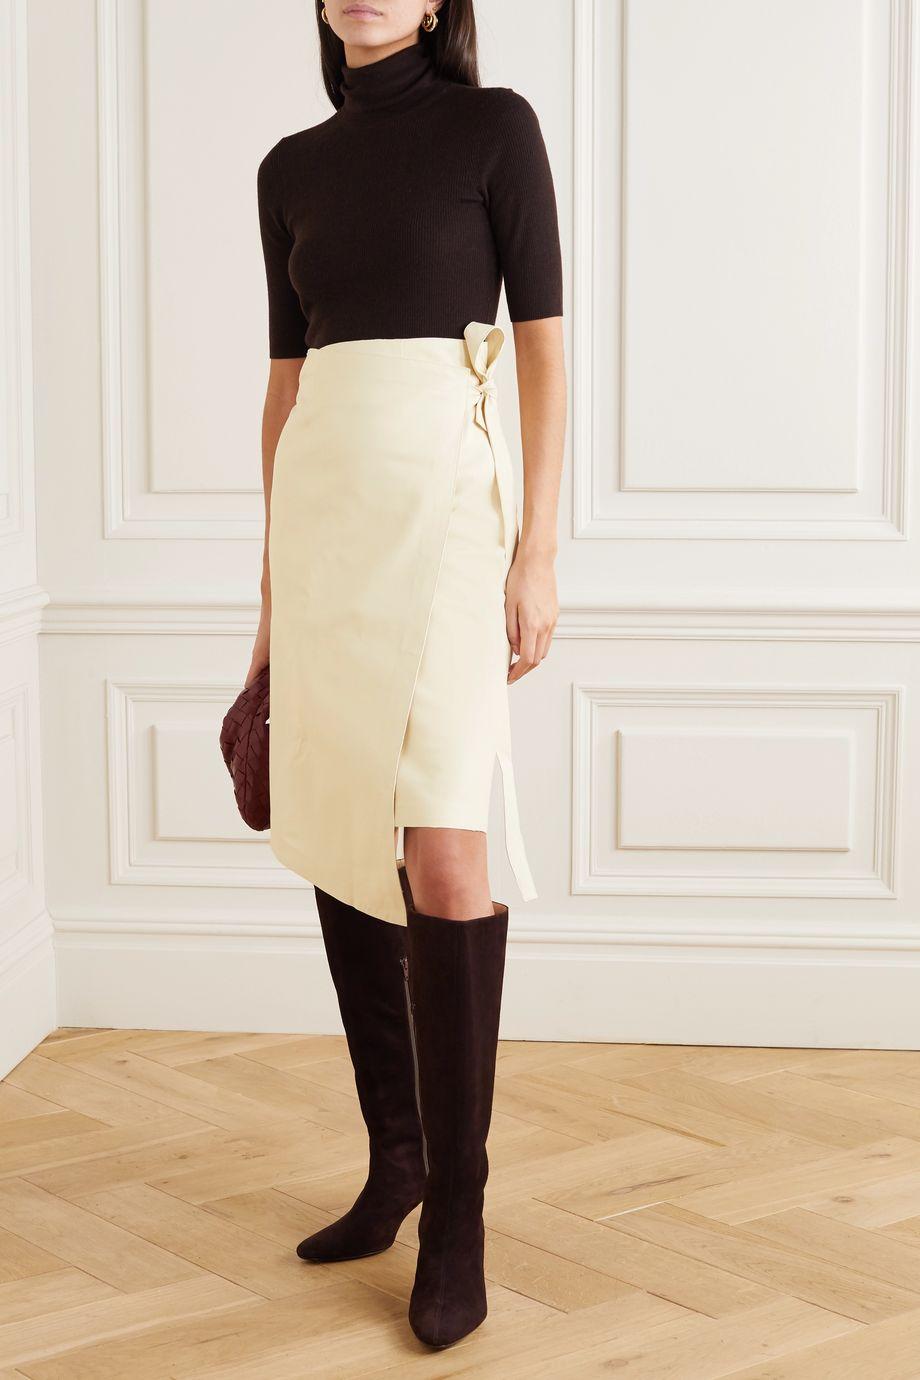 Envelope1976 + NET SUSTAIN Sarajevo leather wrap skirt